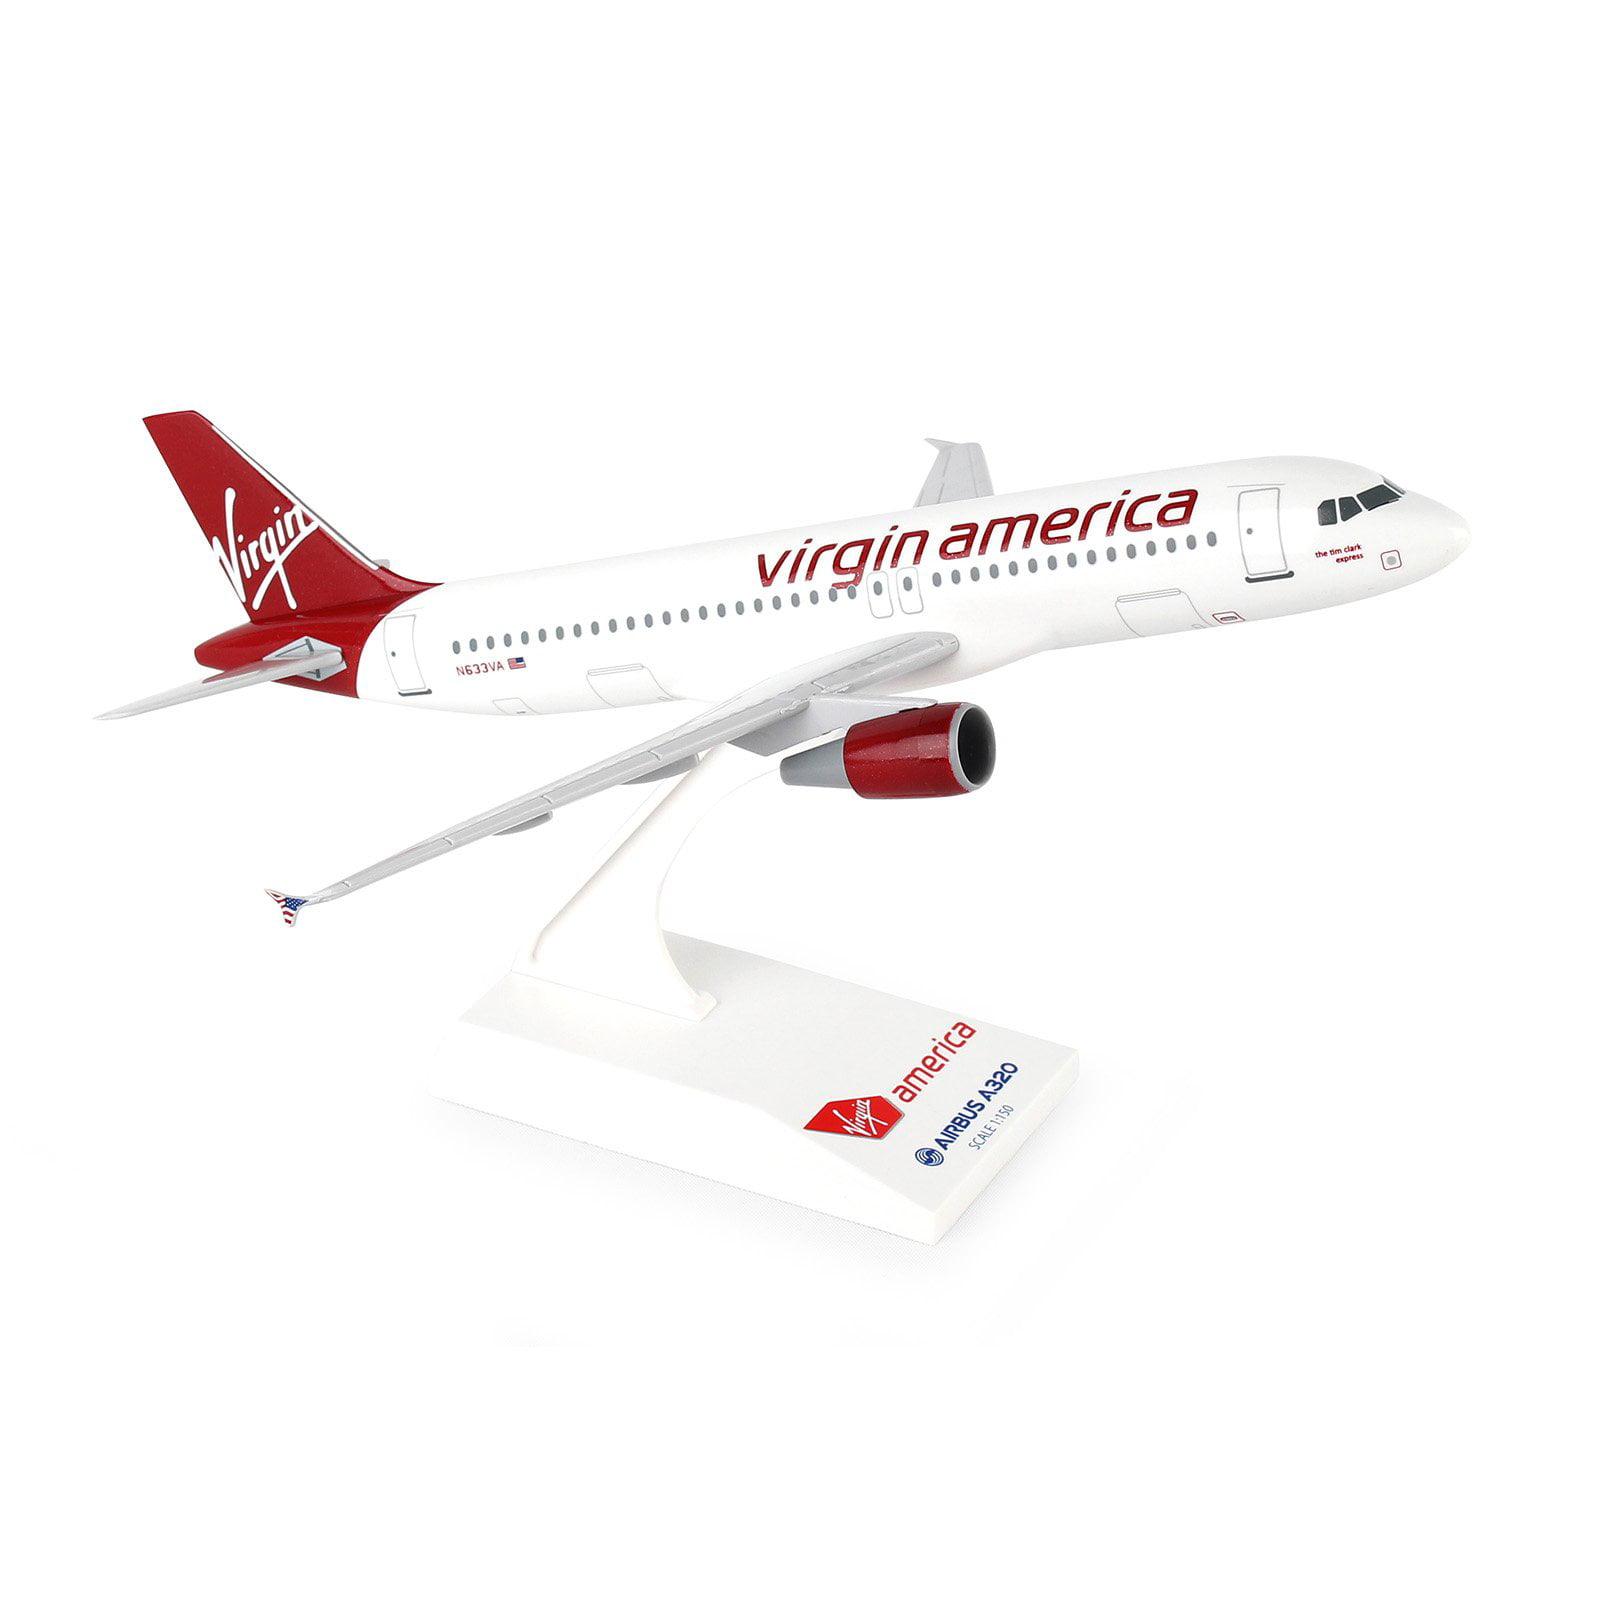 Skymarks Virgin America A320 Model Airplane by DARON